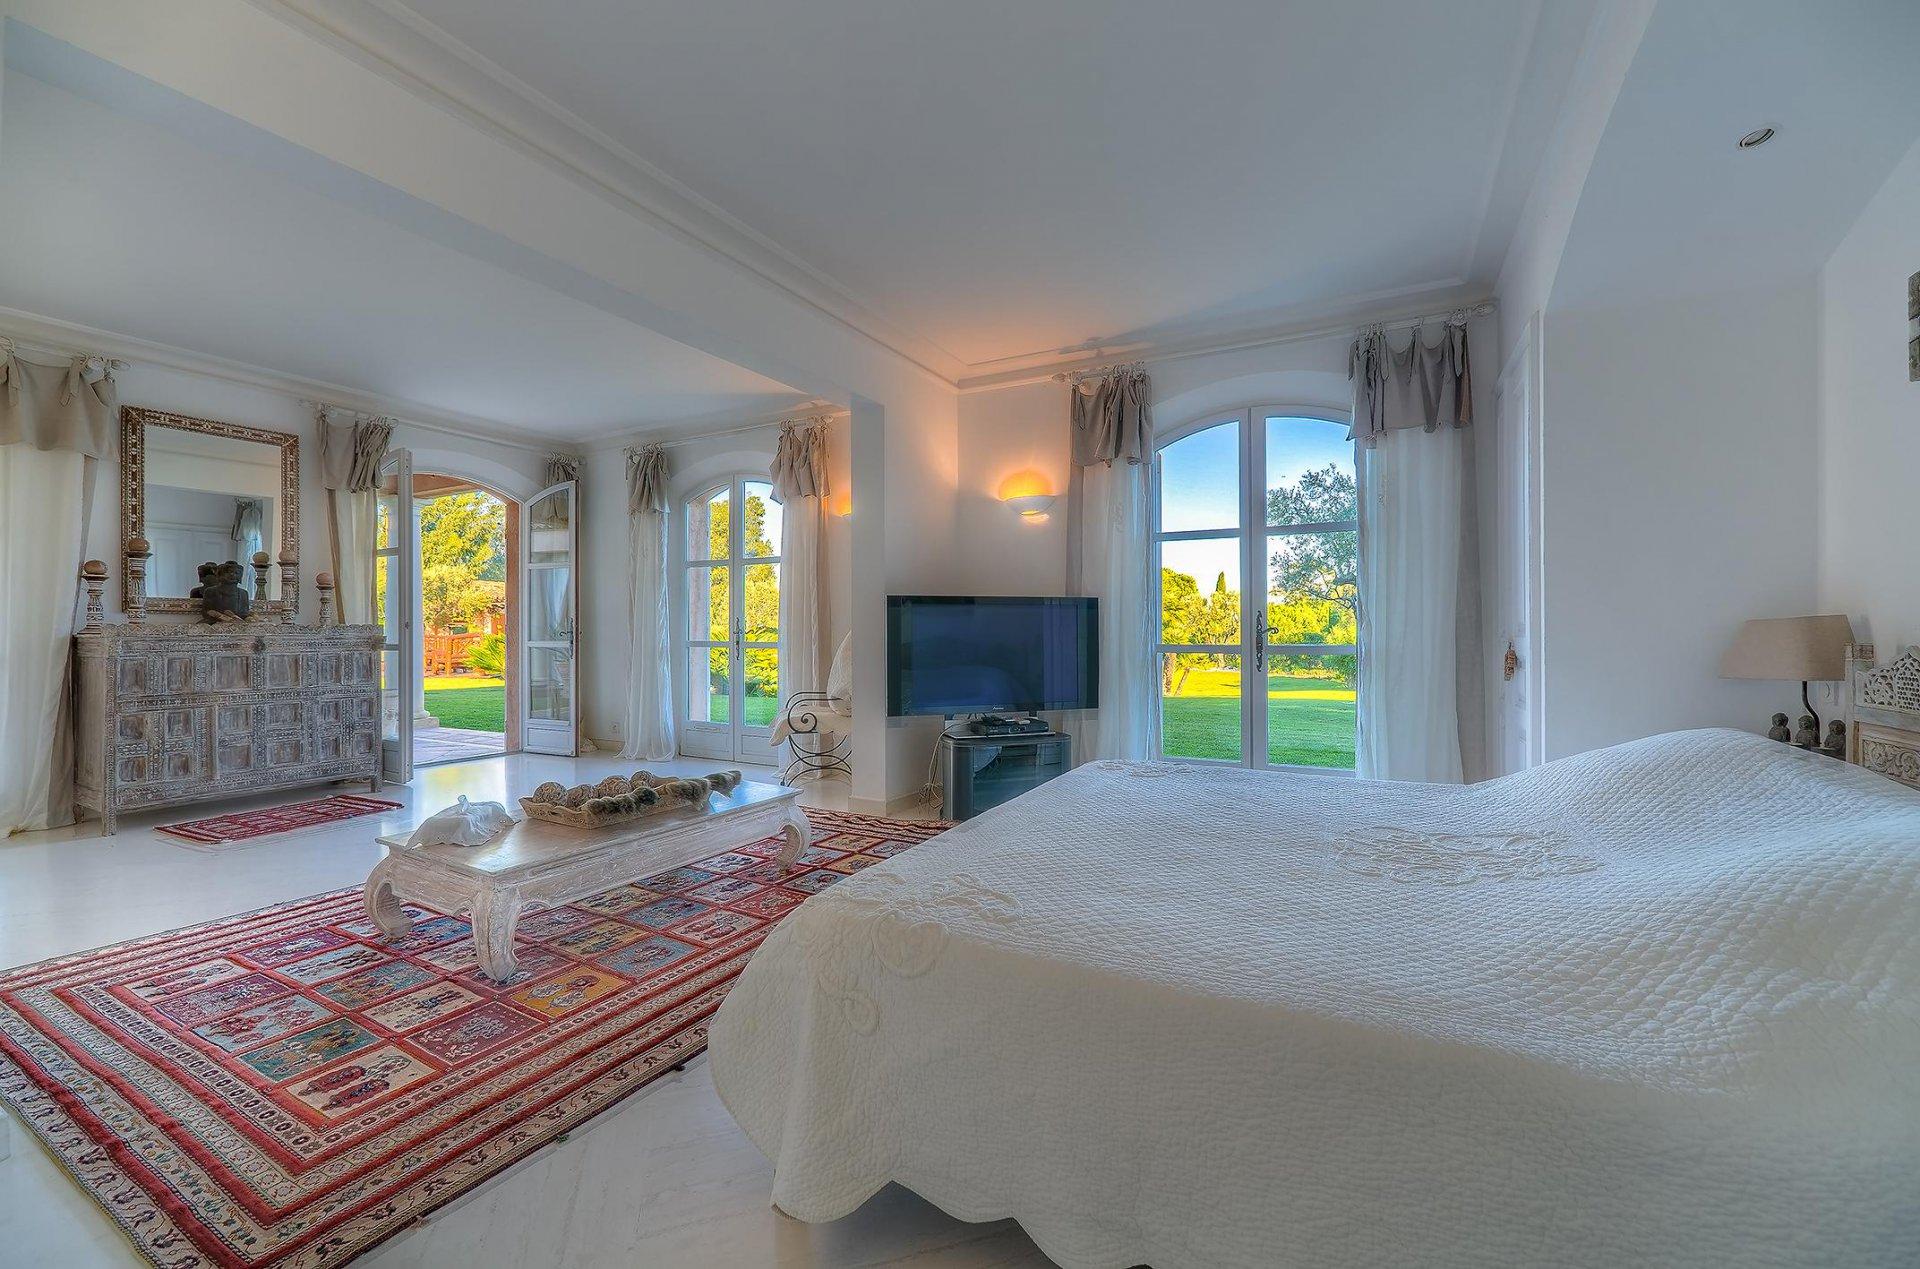 Close to Saint-Tropez - Outstanding villa near beach